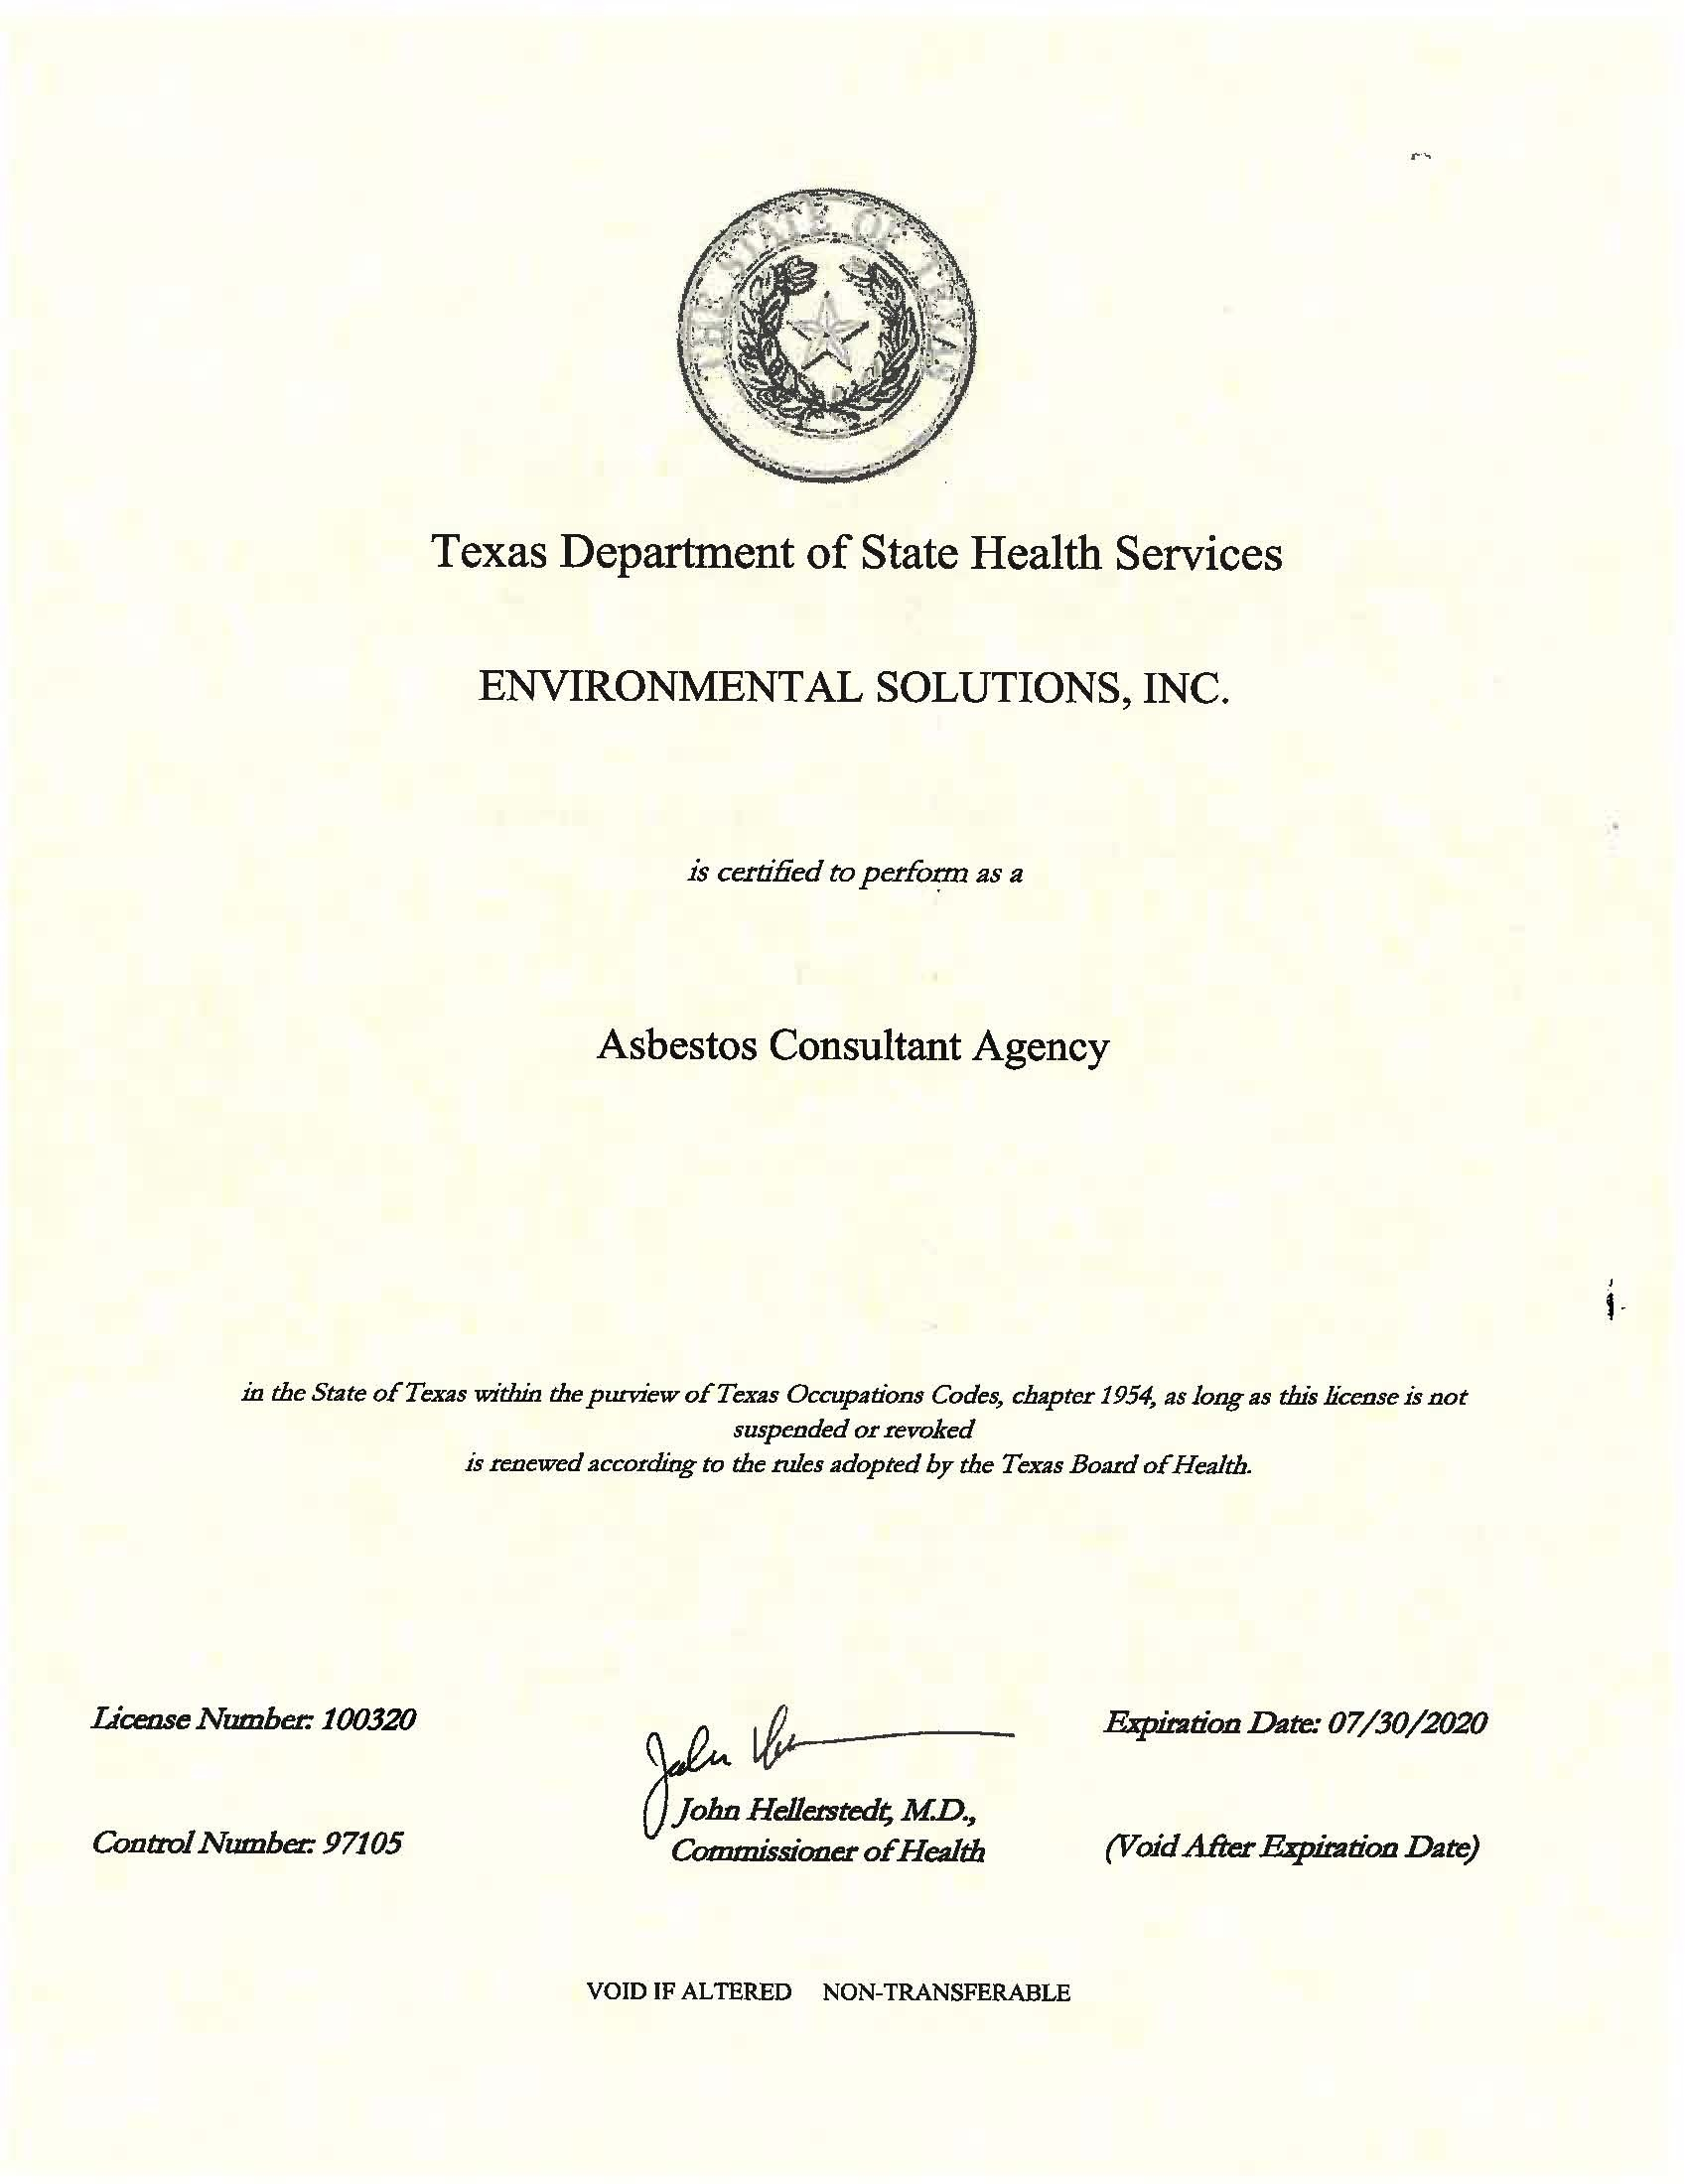 Asbestos Consultant Agency License